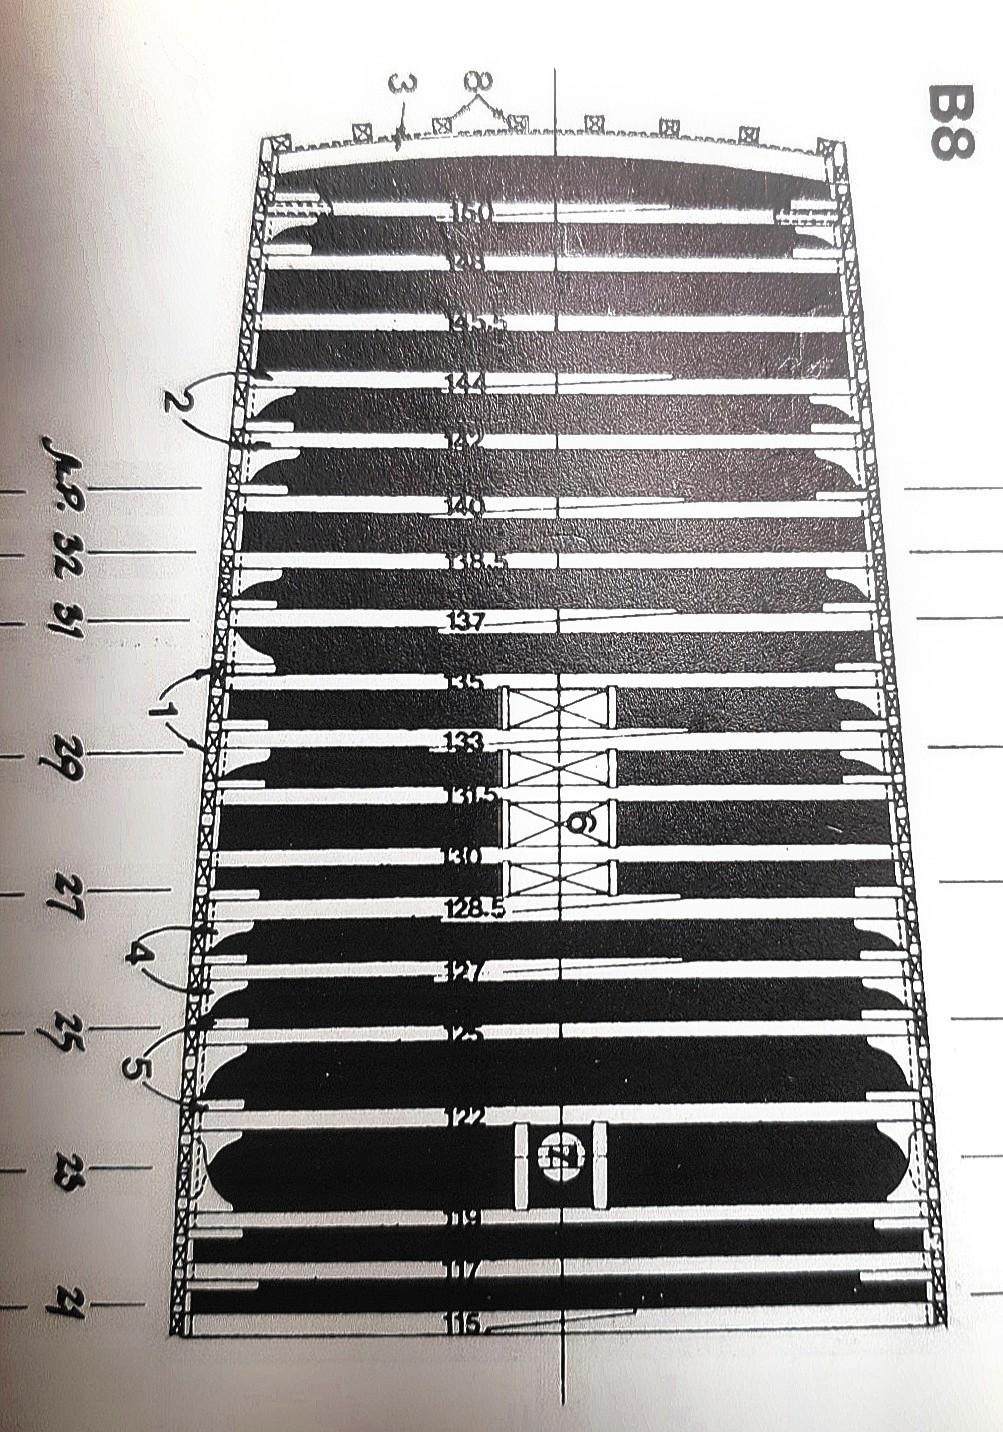 HMS Victory (1765) Artesania Latina 1/84 - Page 2 2019-011